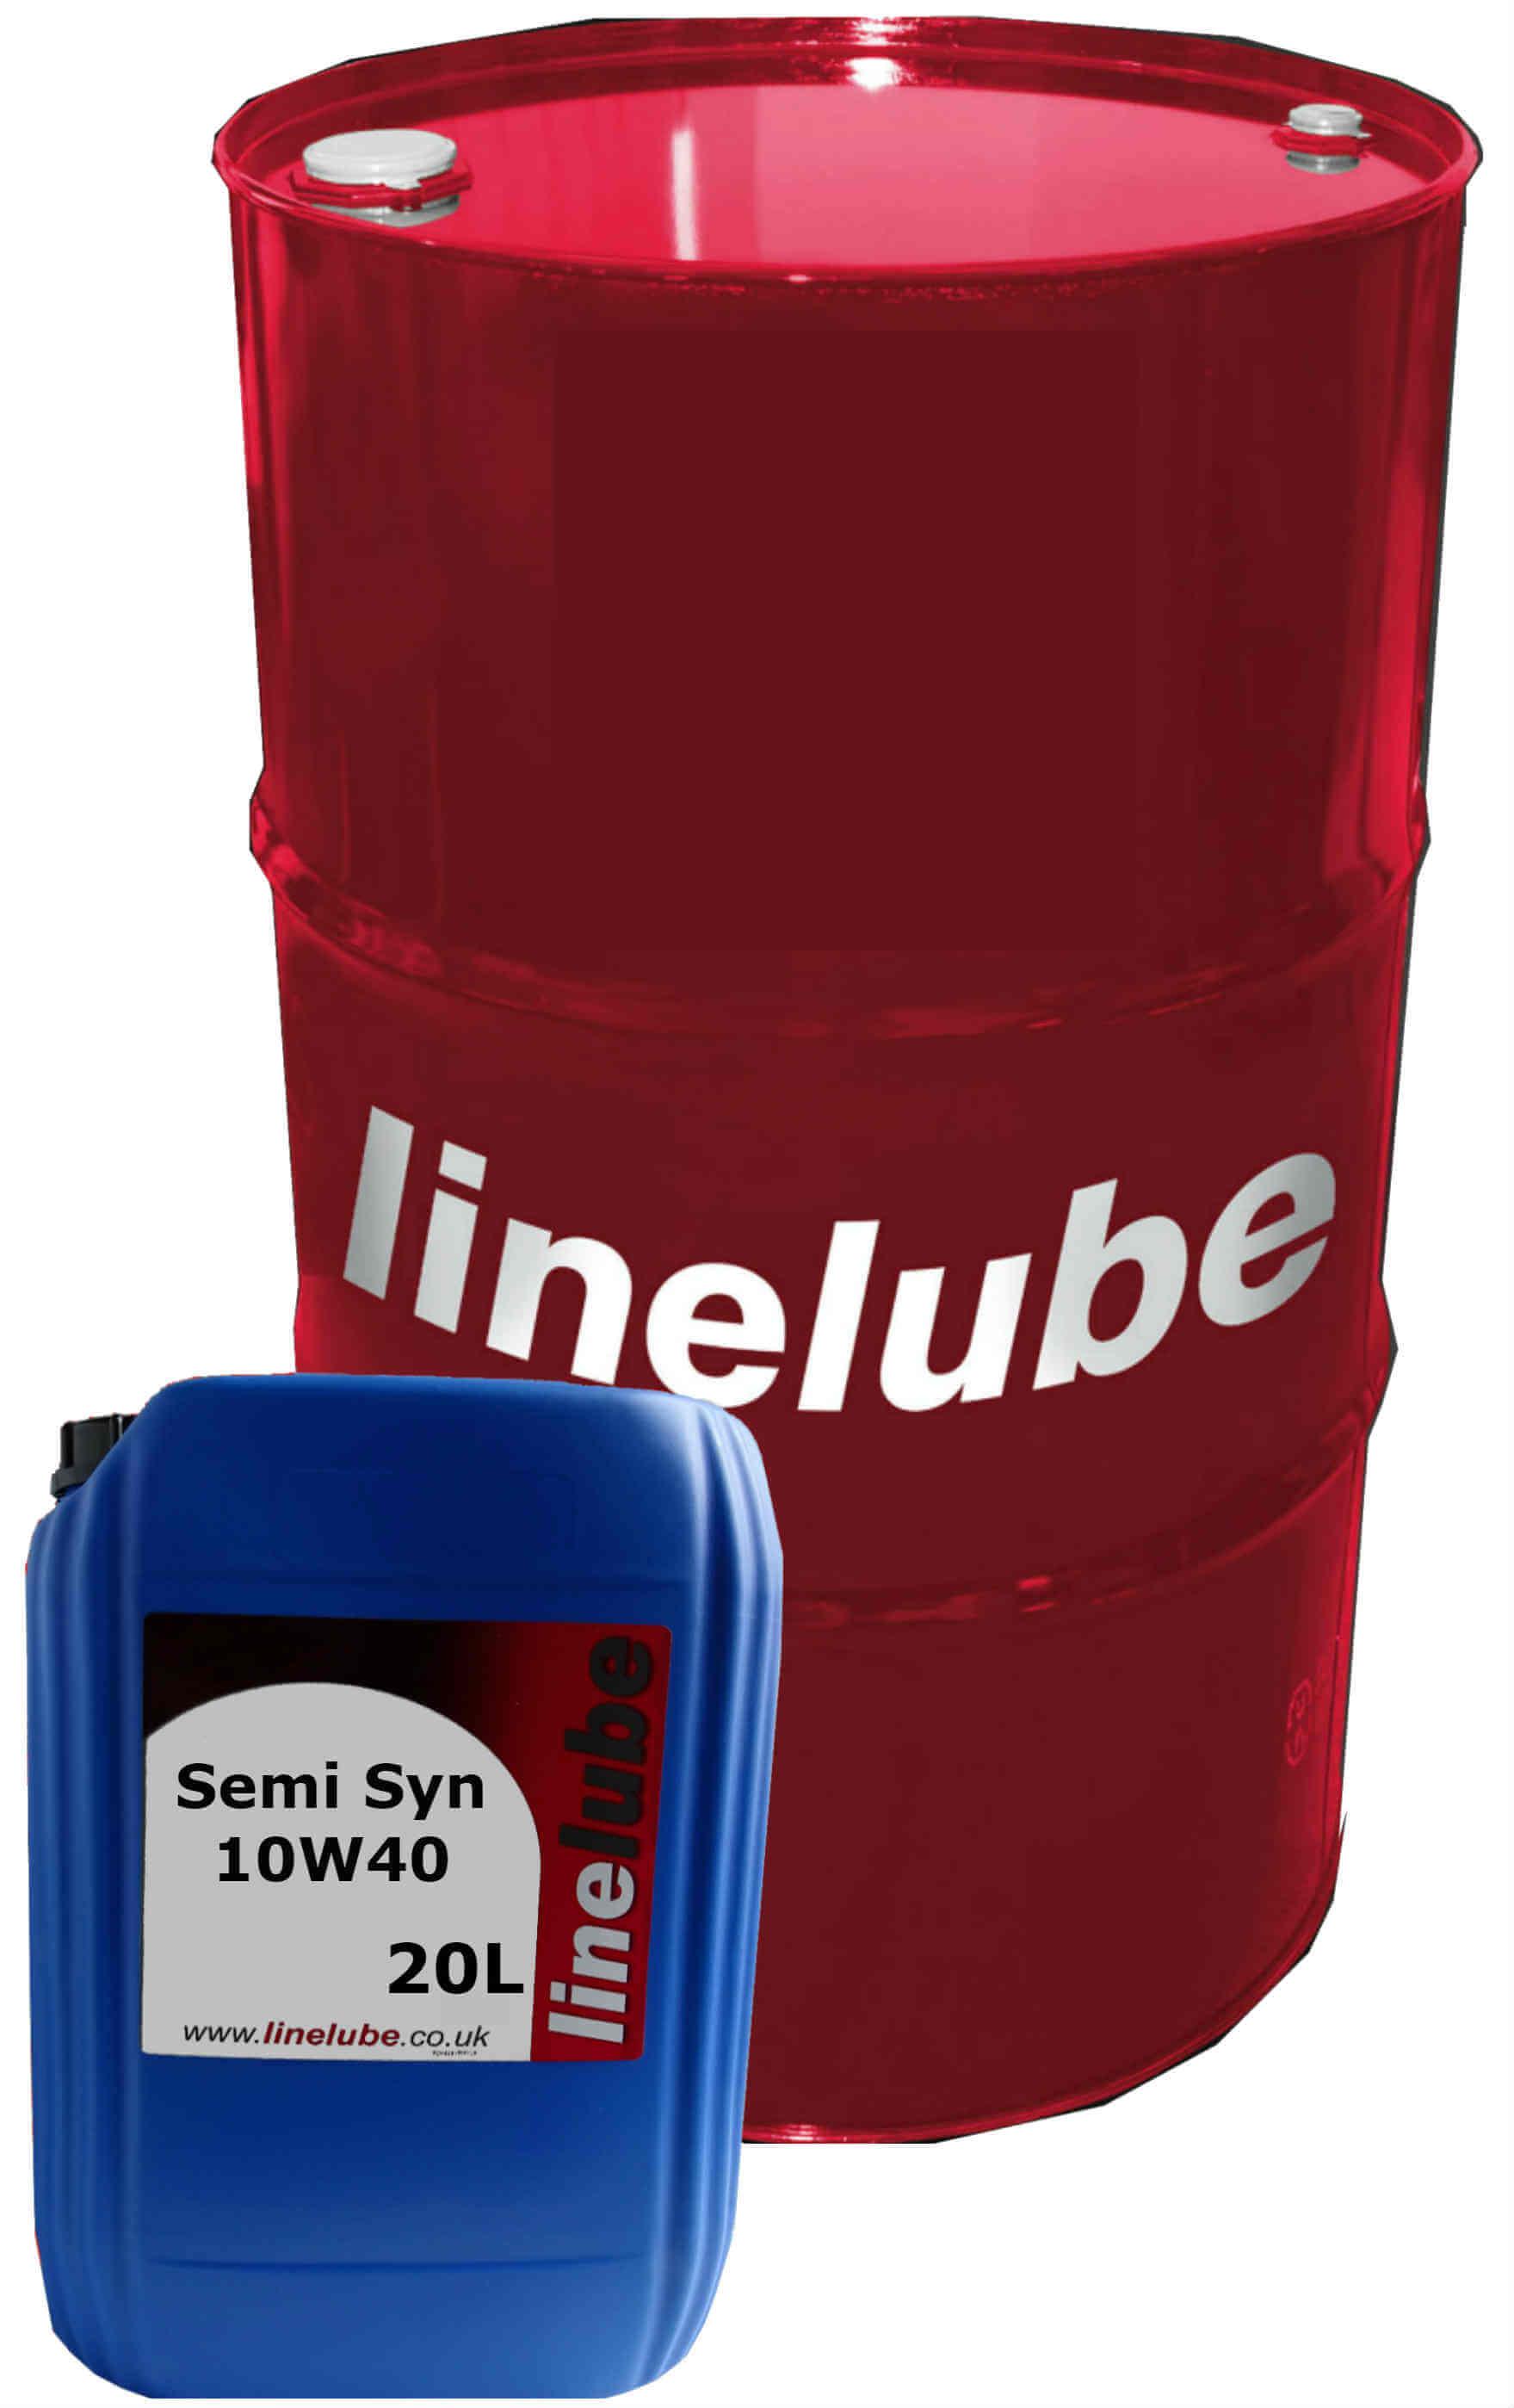 linelube Semi Synthetic 10W-40